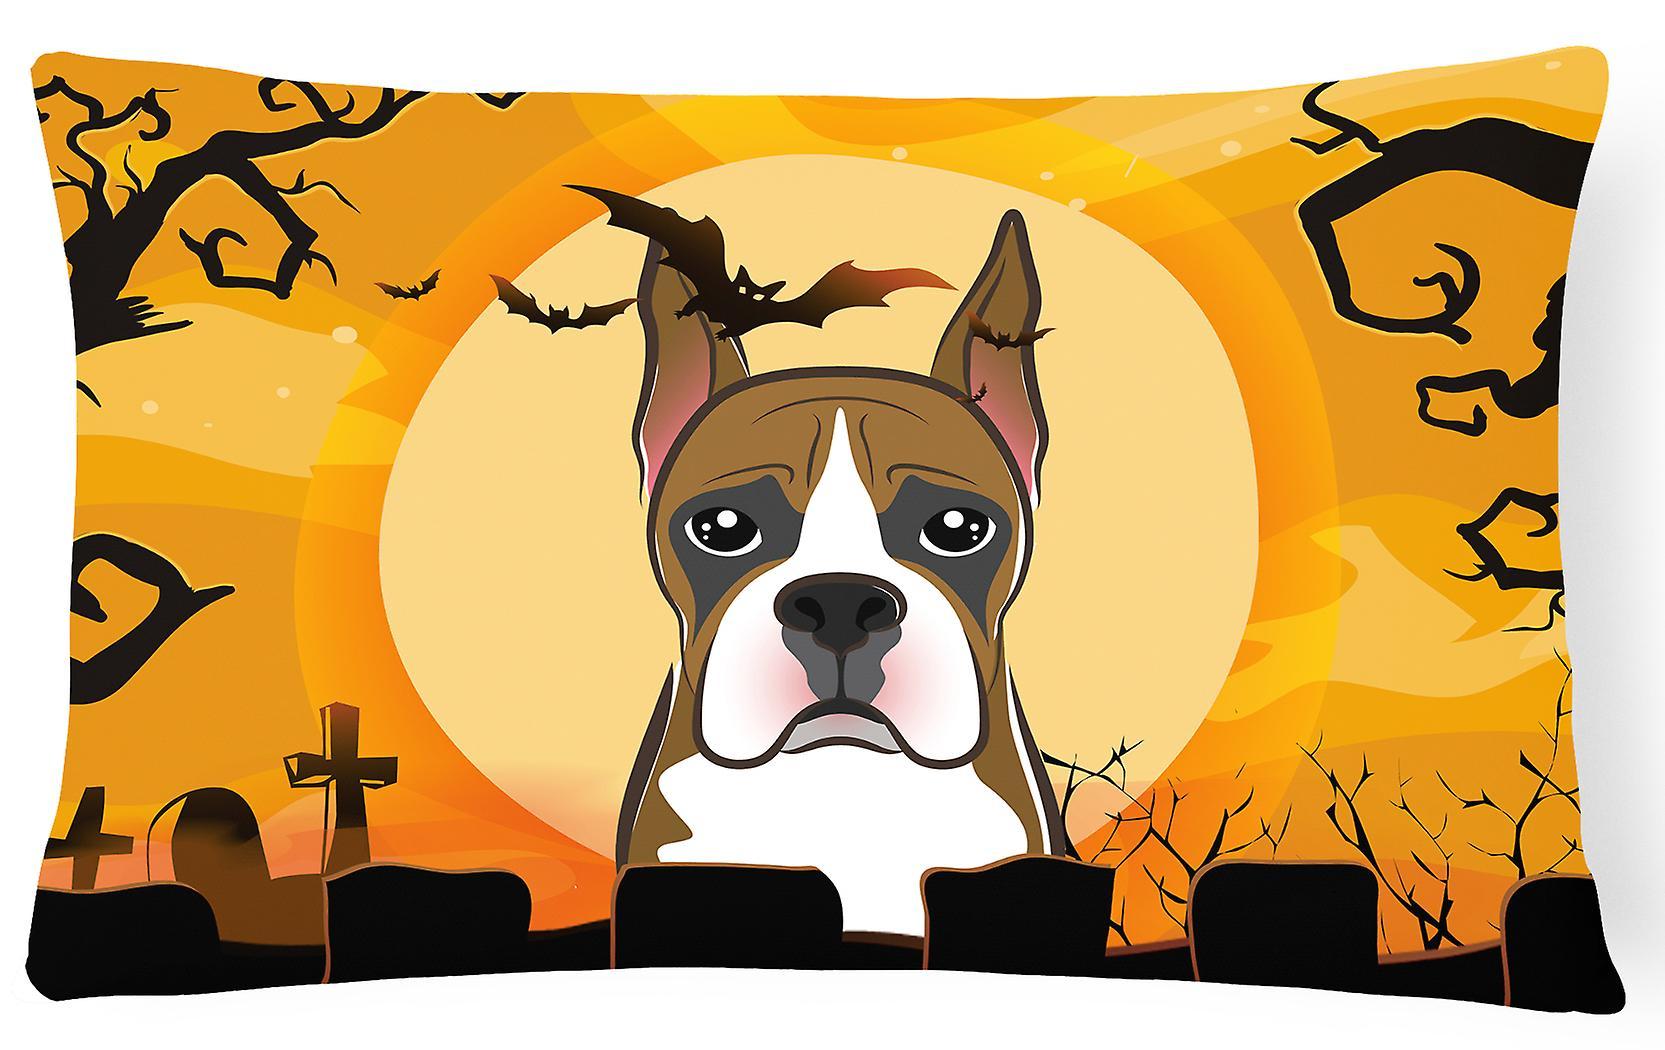 Des Halloween Oreiller Bb1781pw1216 Boxer Décoratif Carolines Trésors Tissu luJ31TKFc